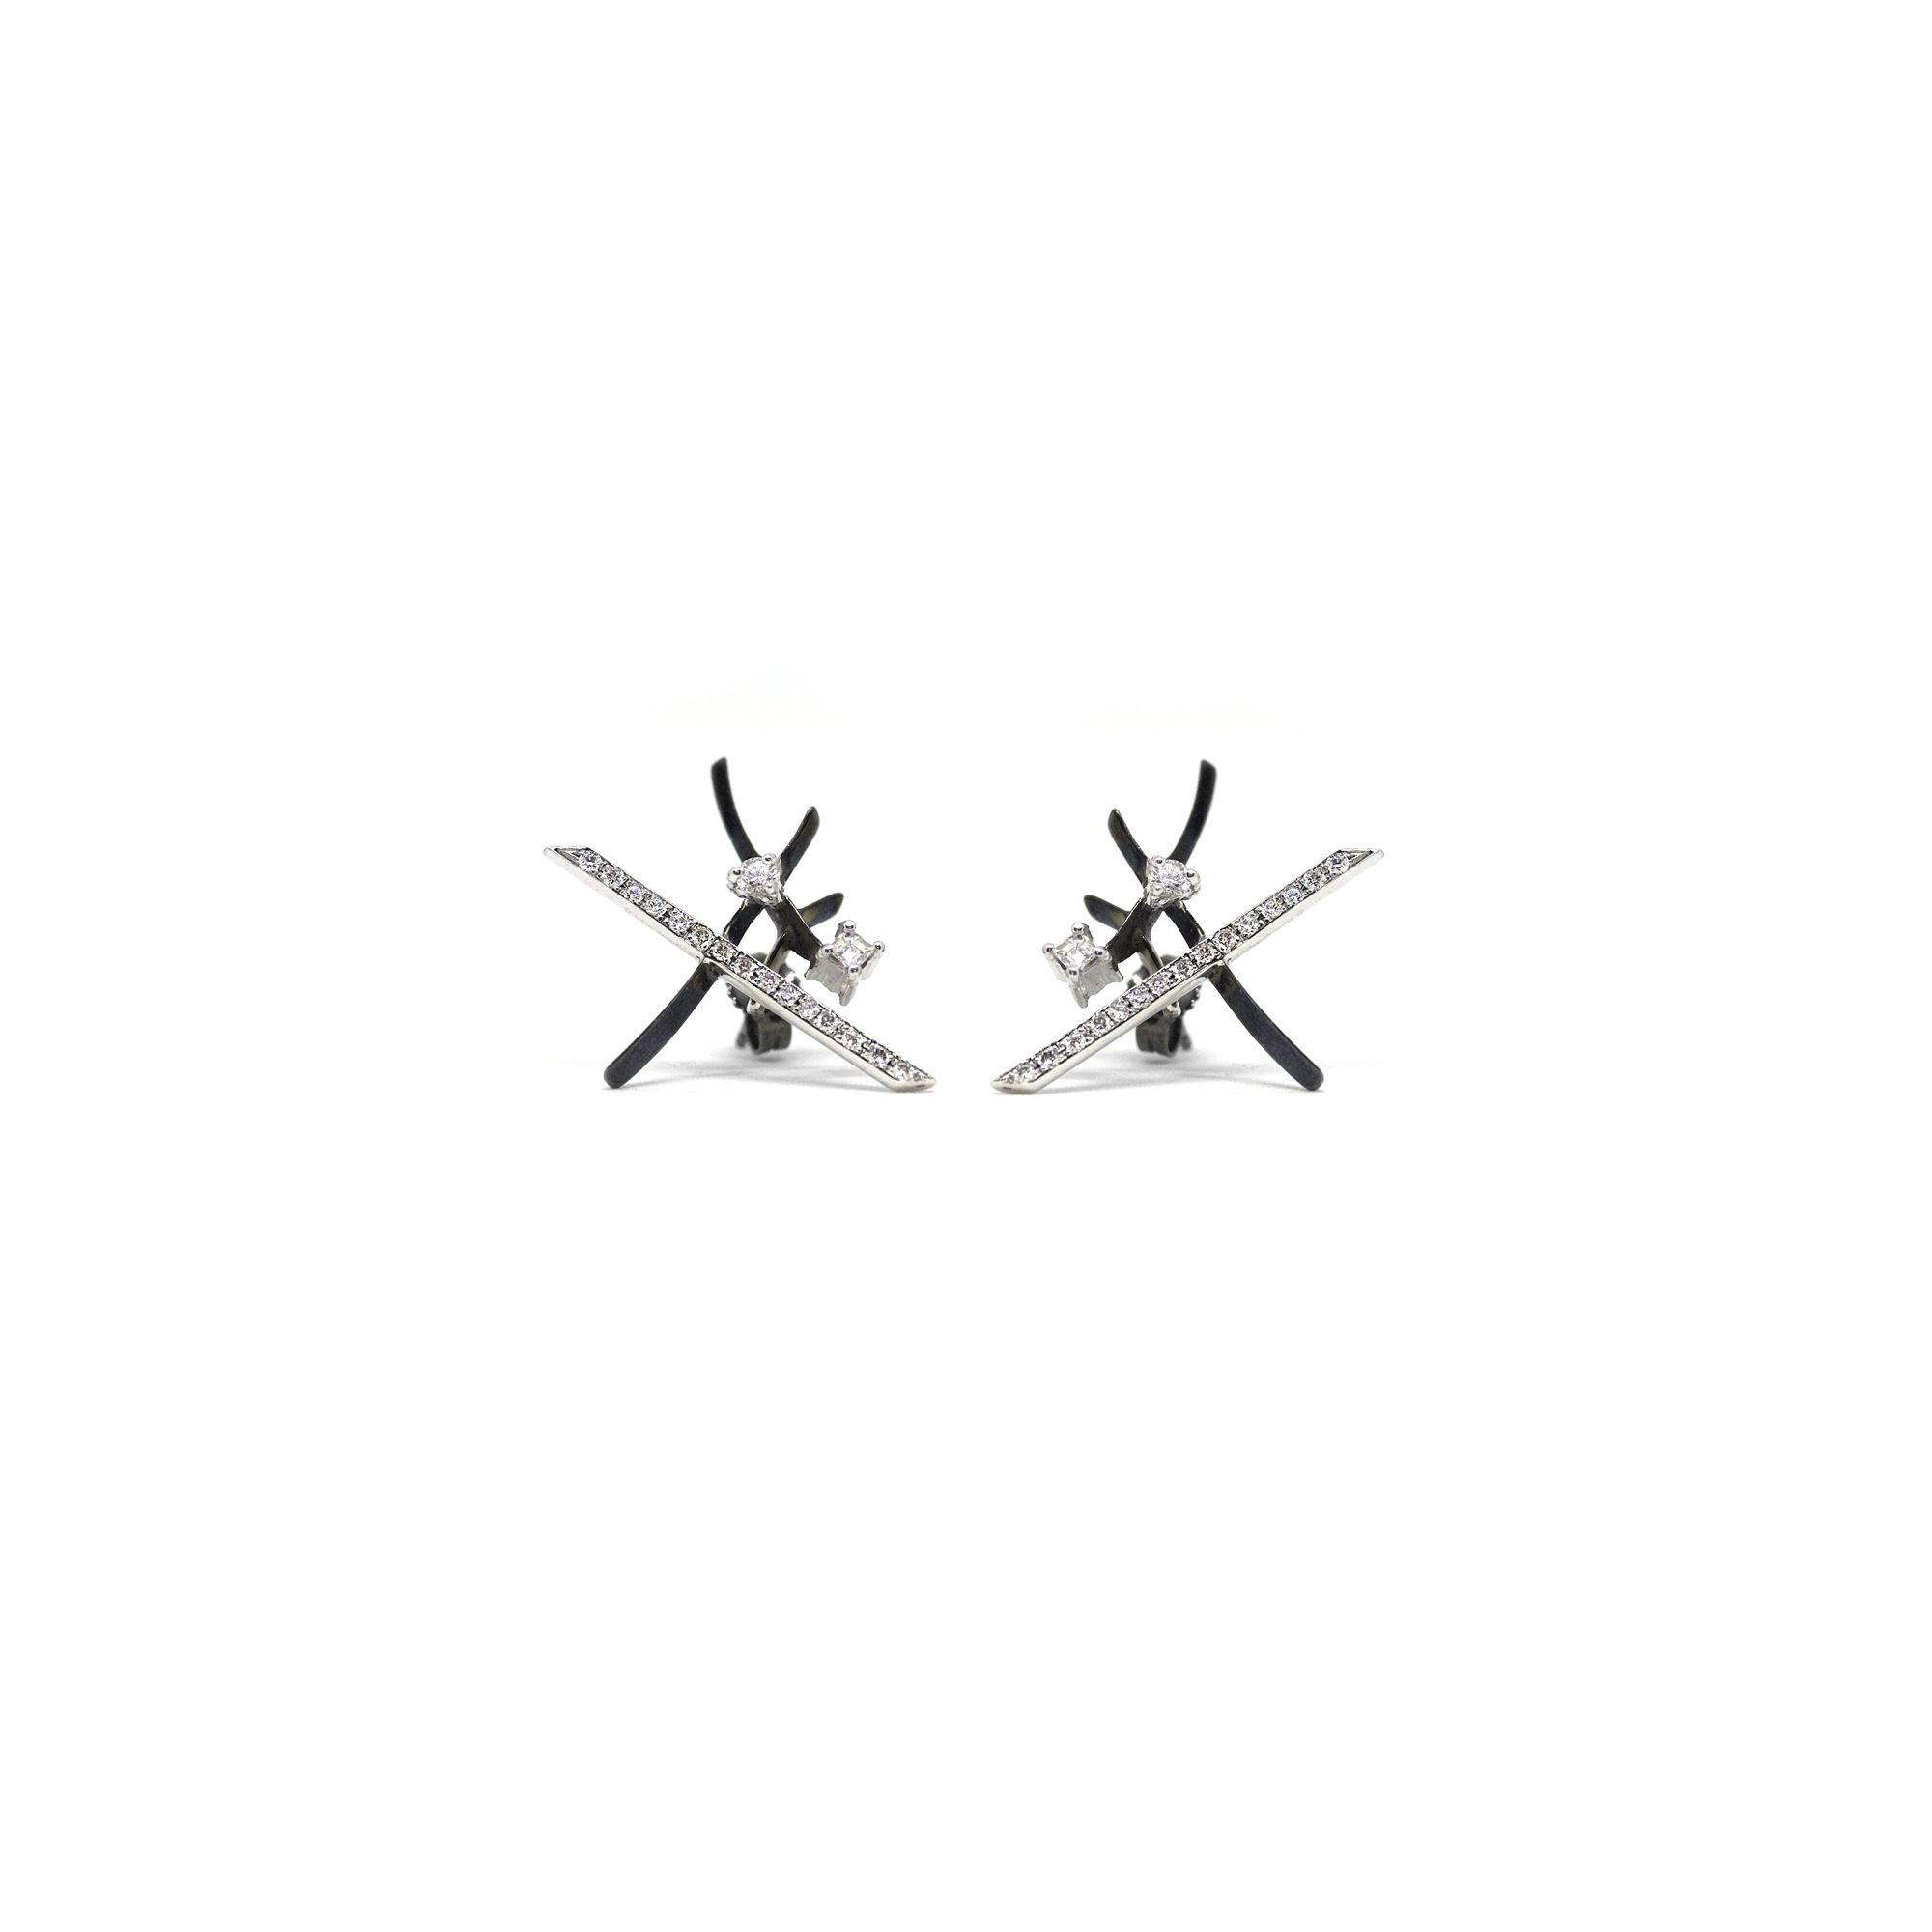 'Kandinsky' earrings White gold earrings with diamonds